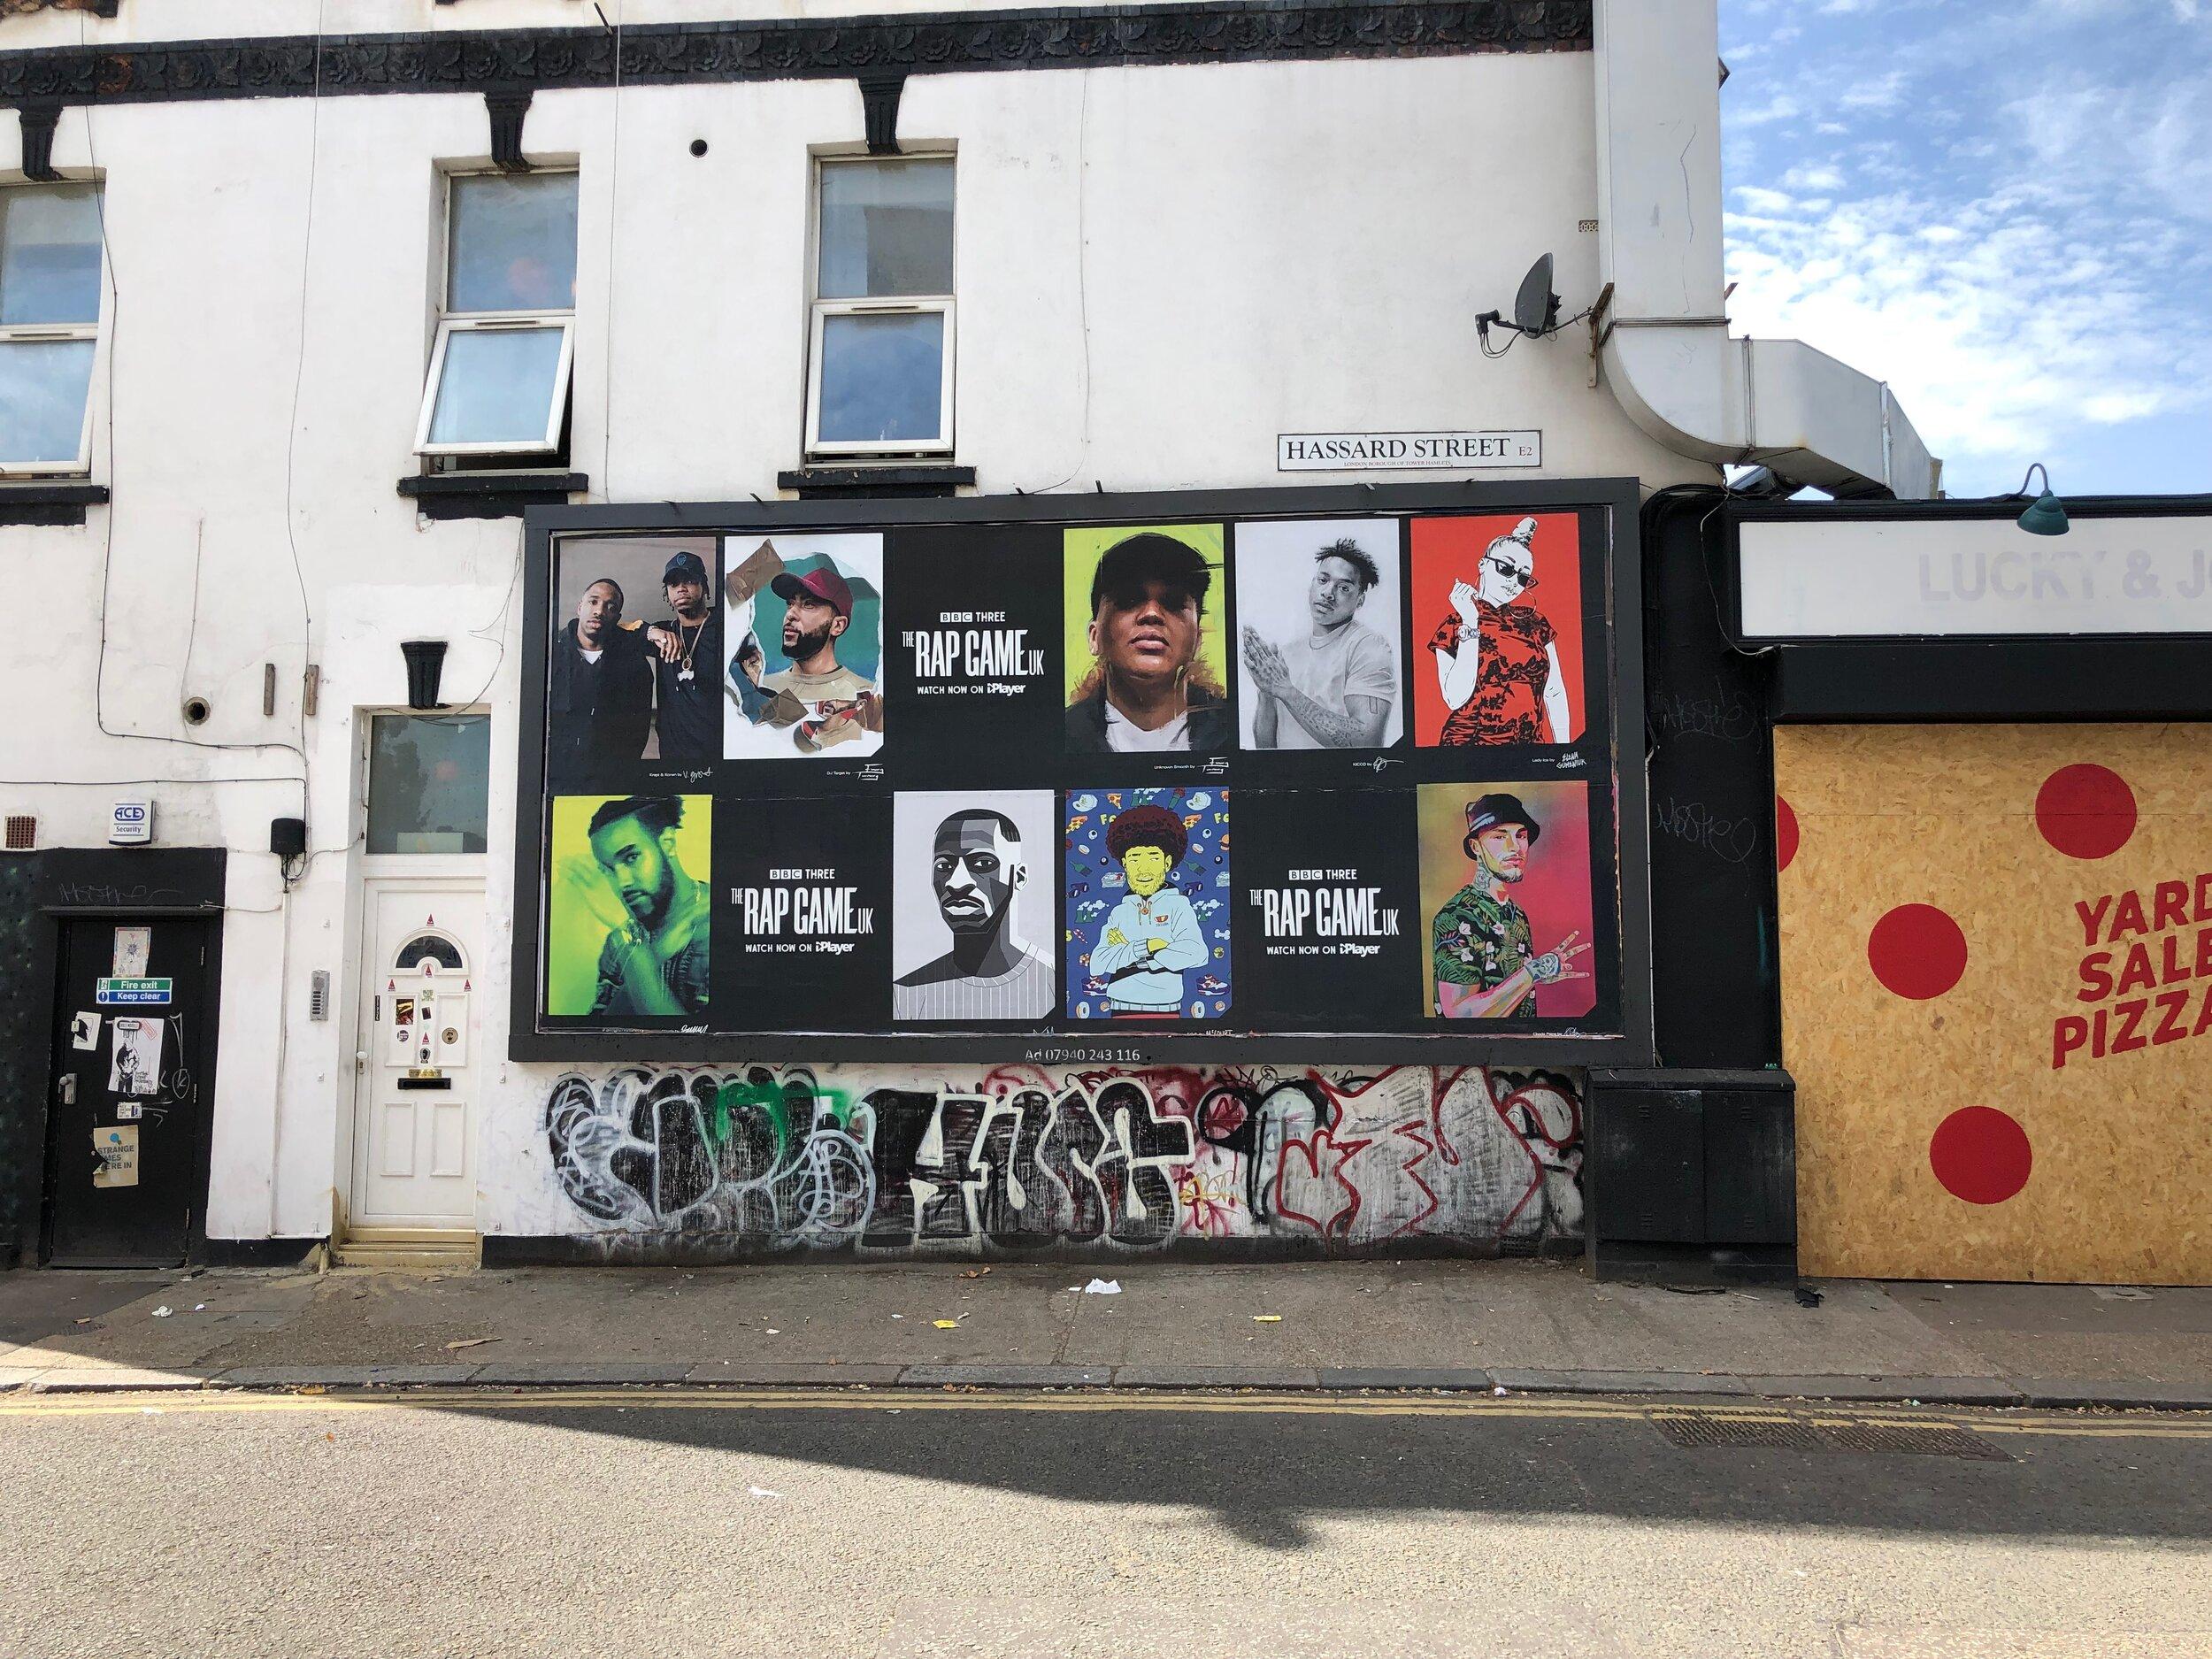 Elena Gumeniuk for BBC The Rap Game UK - Advertising on Hassard Street, Hackney, London.